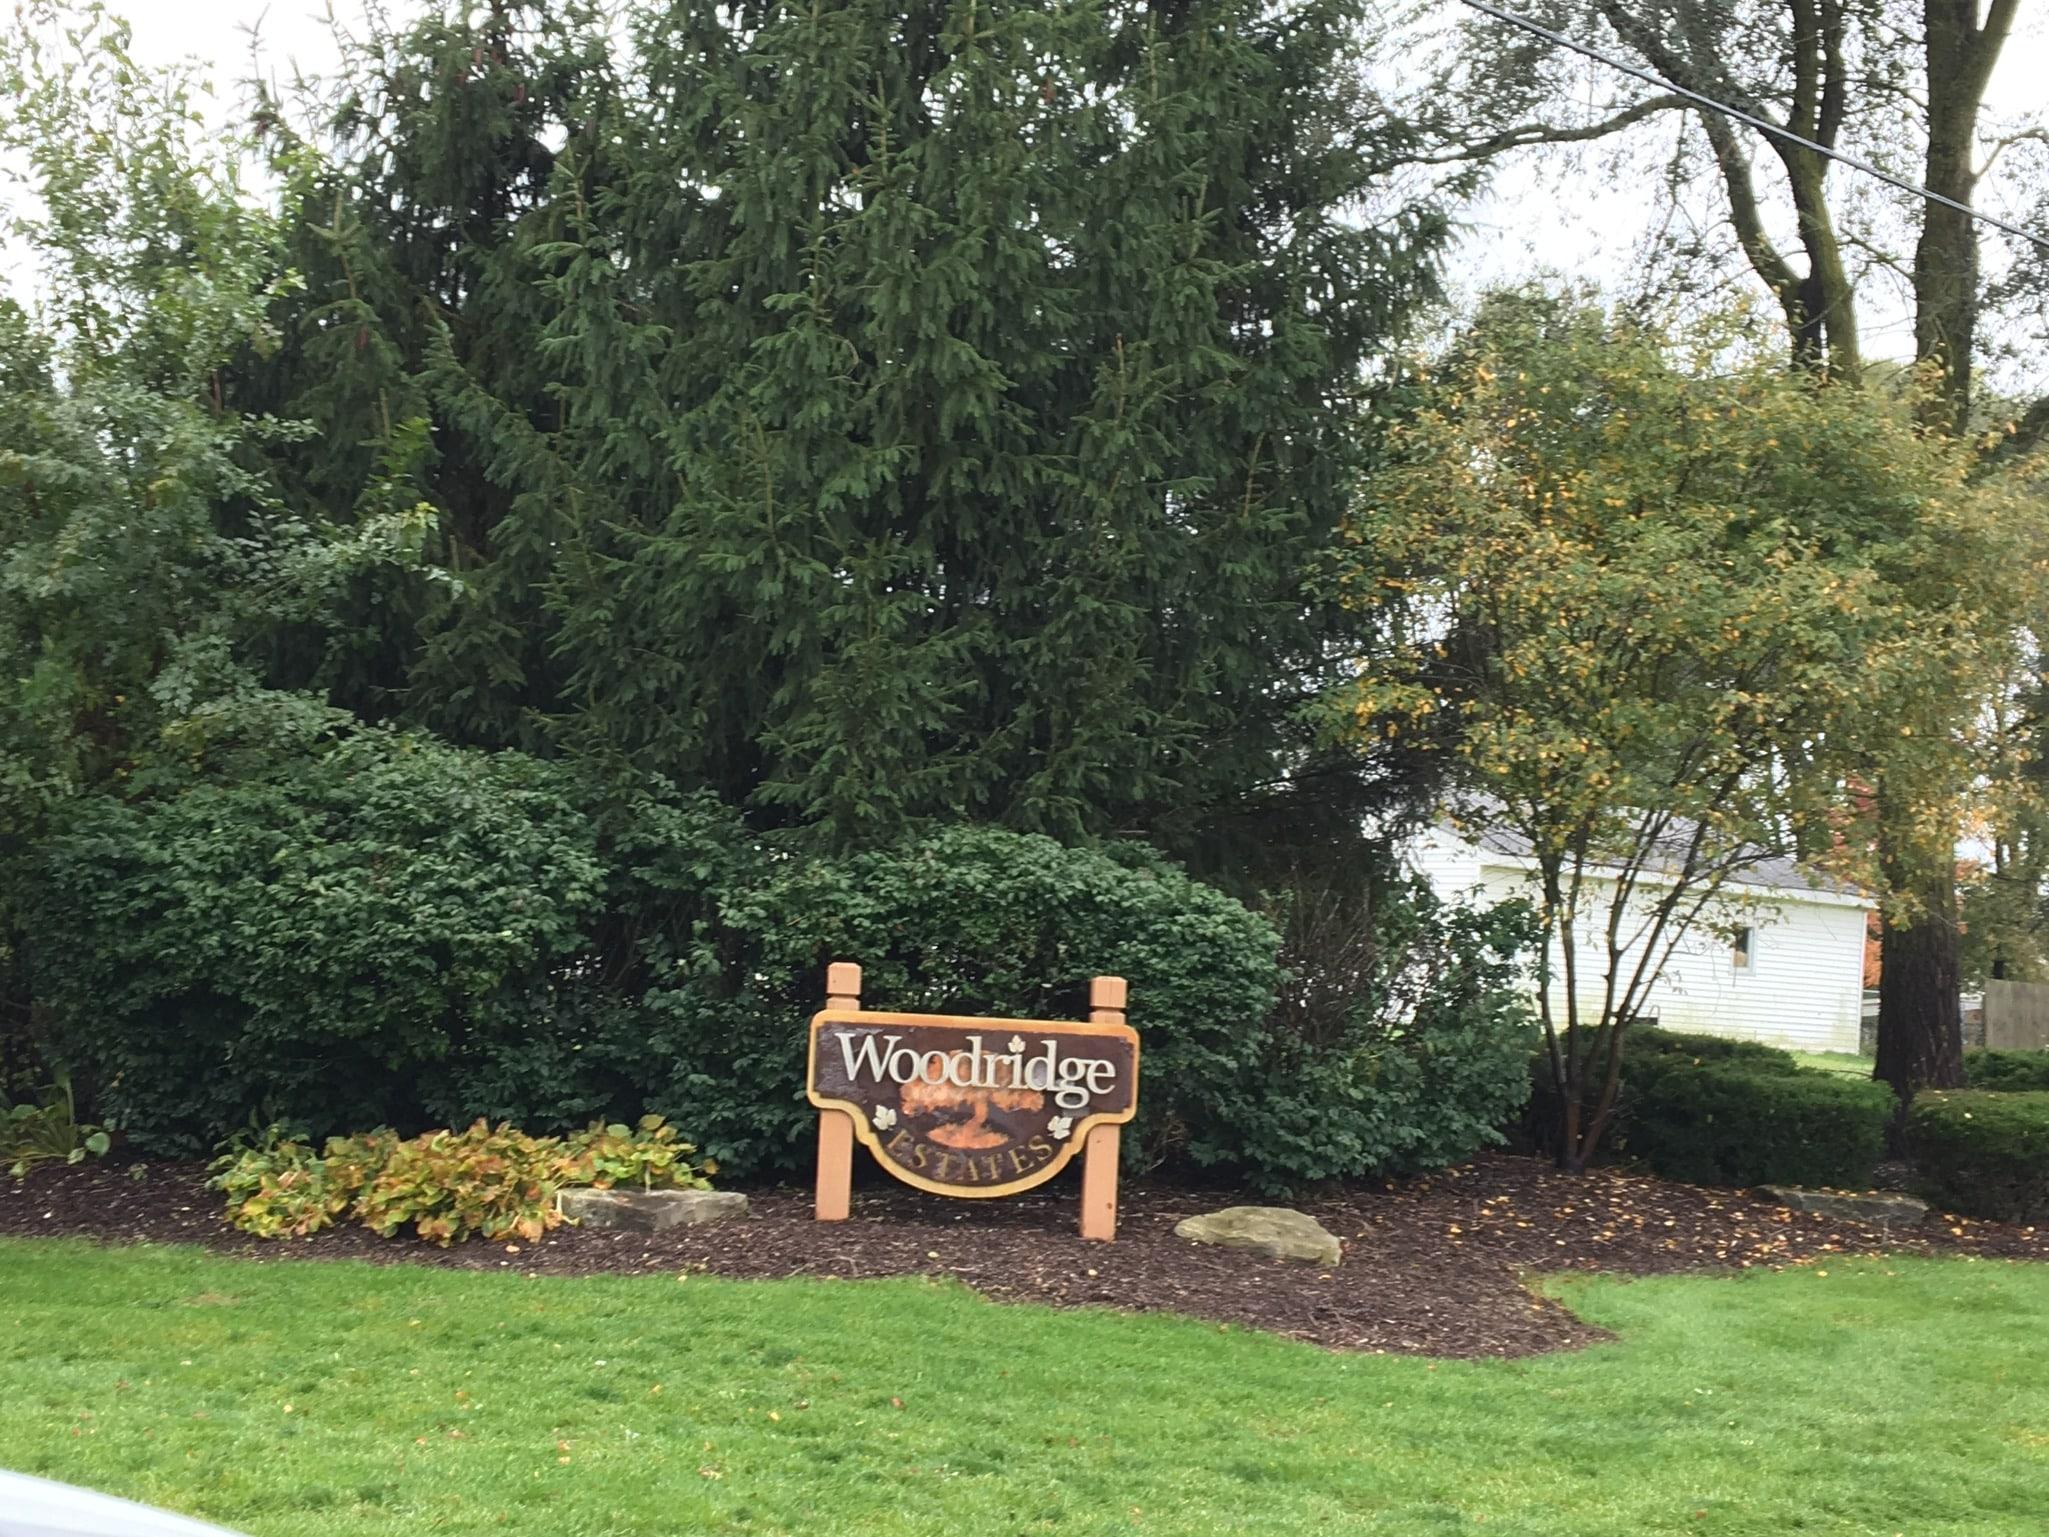 Entrance Sign for Woodridge